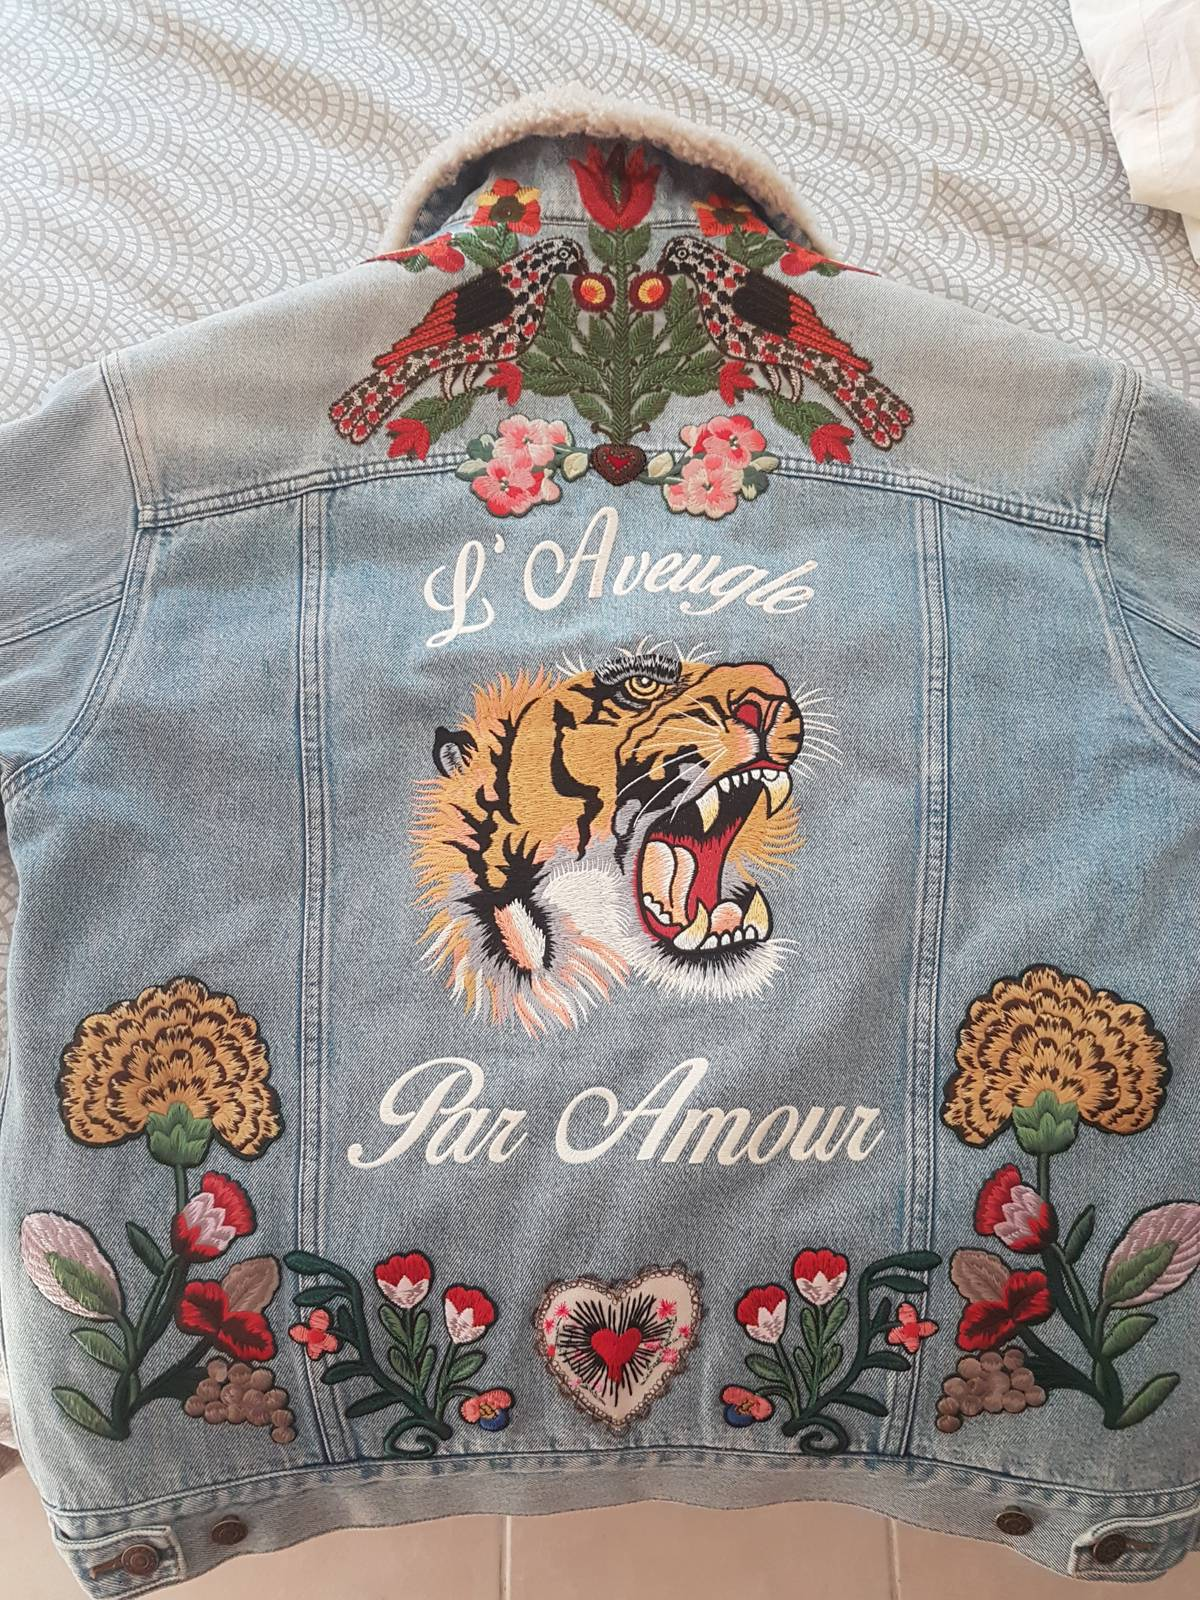 ea10e6a933dc Gucci Gucci L Aveugle Par Amour Embroidered Denim Jacket with Fur ...